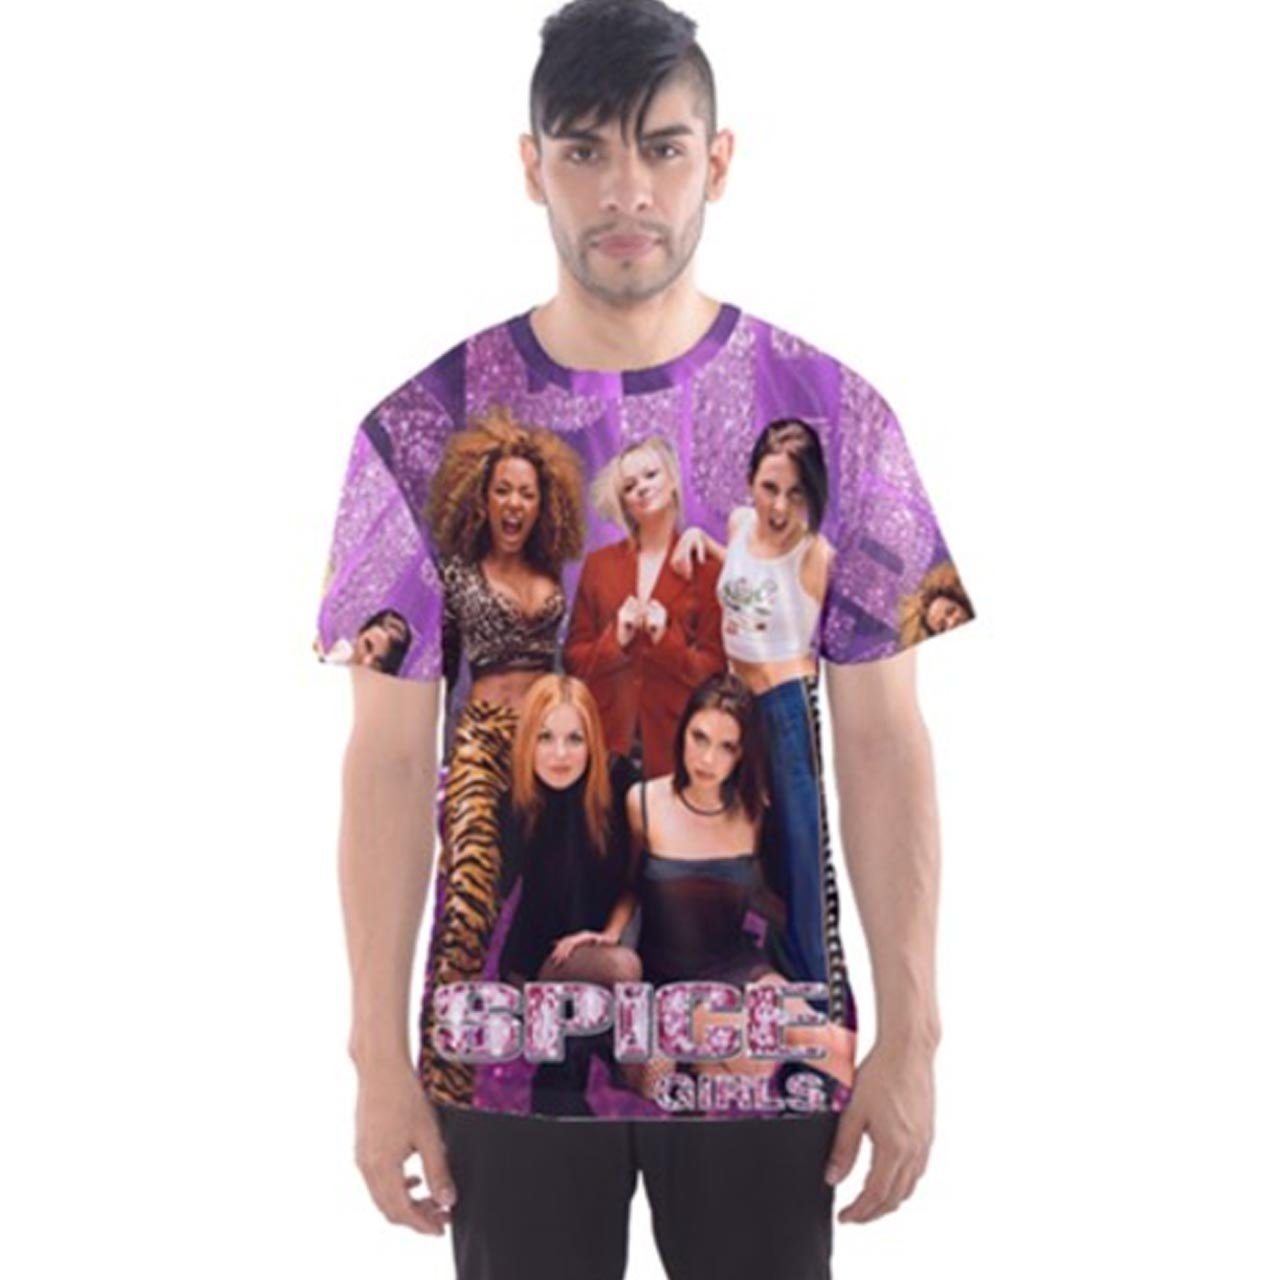 Spice Girls TeeメンズTシャツTee Fullprint Tシャツサイズ3 x l   B075DXMCYQ